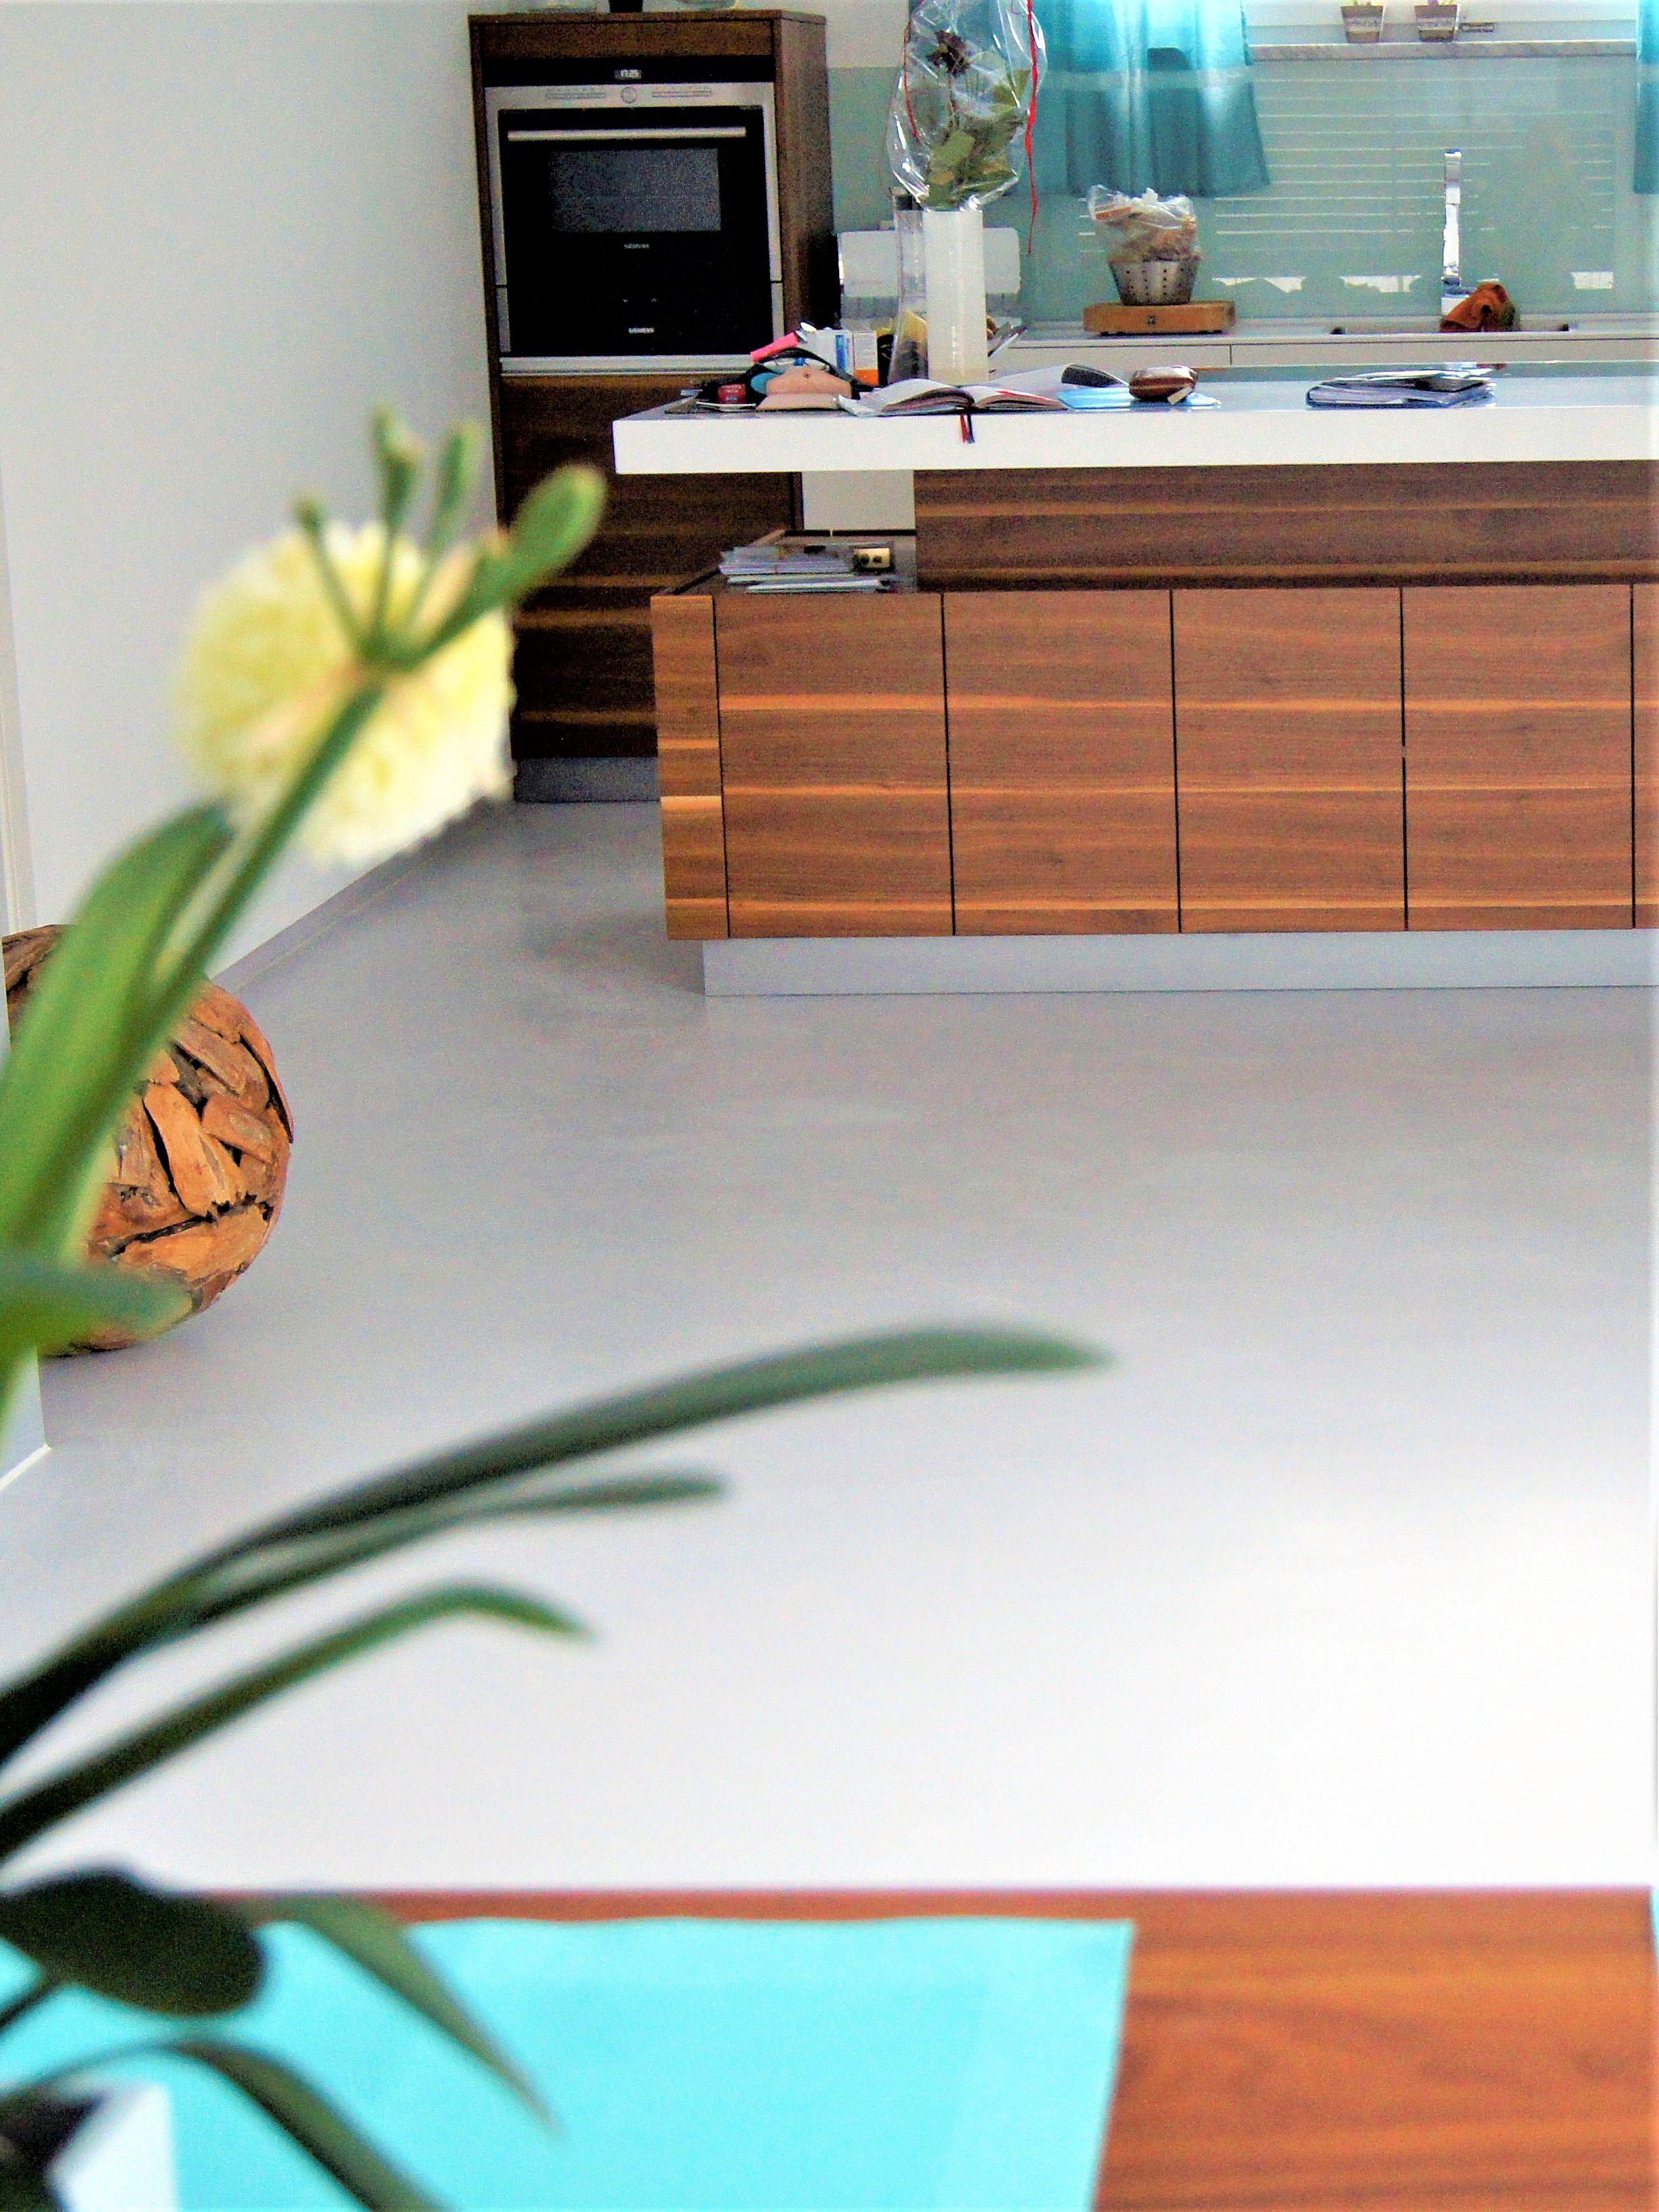 Fugenloser Boden Als Kuchenboden By Fugenlos Modern De Kuchenboden Haus Deko Boden